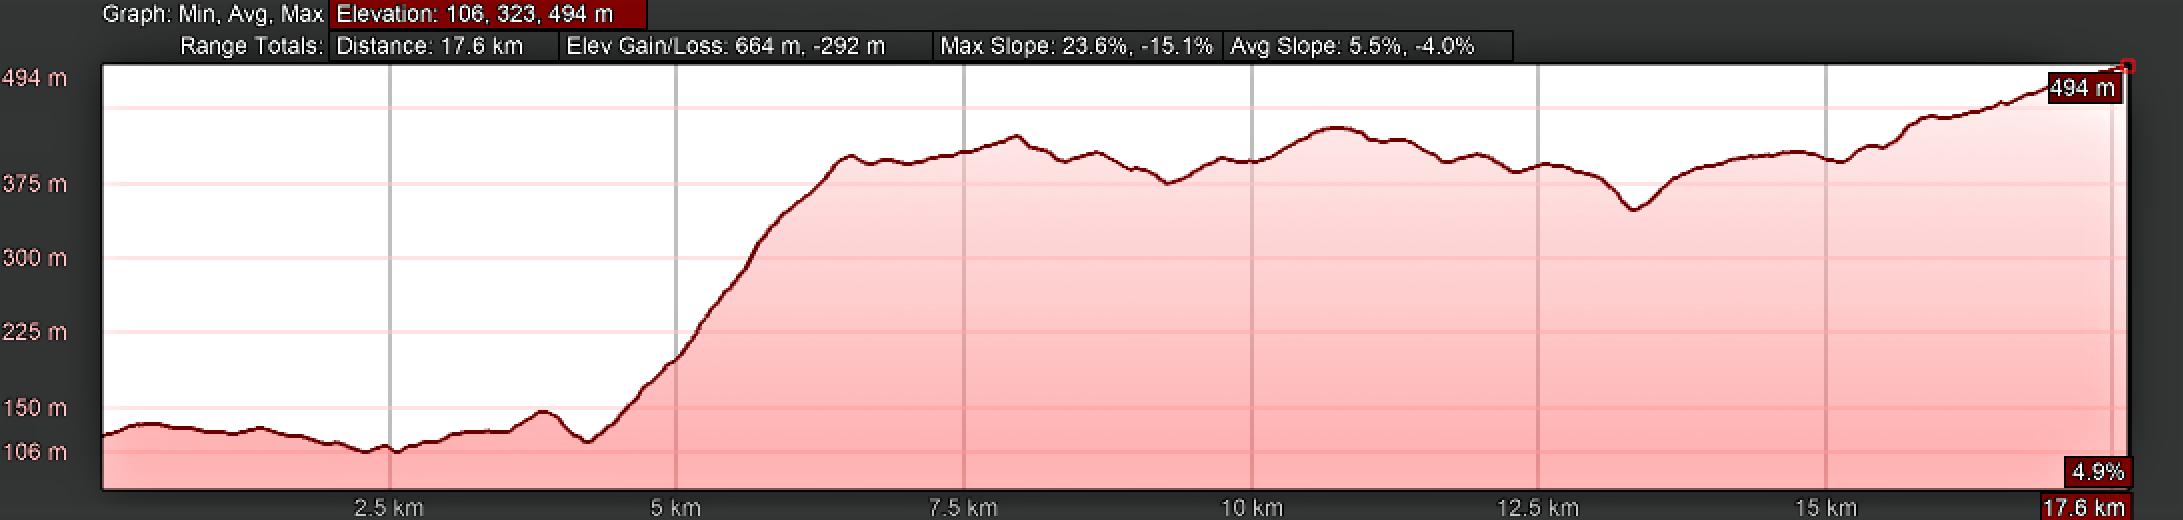 Elevation Profile, Camino Sanabrés, Ourense to Cea, Canedo Alternative